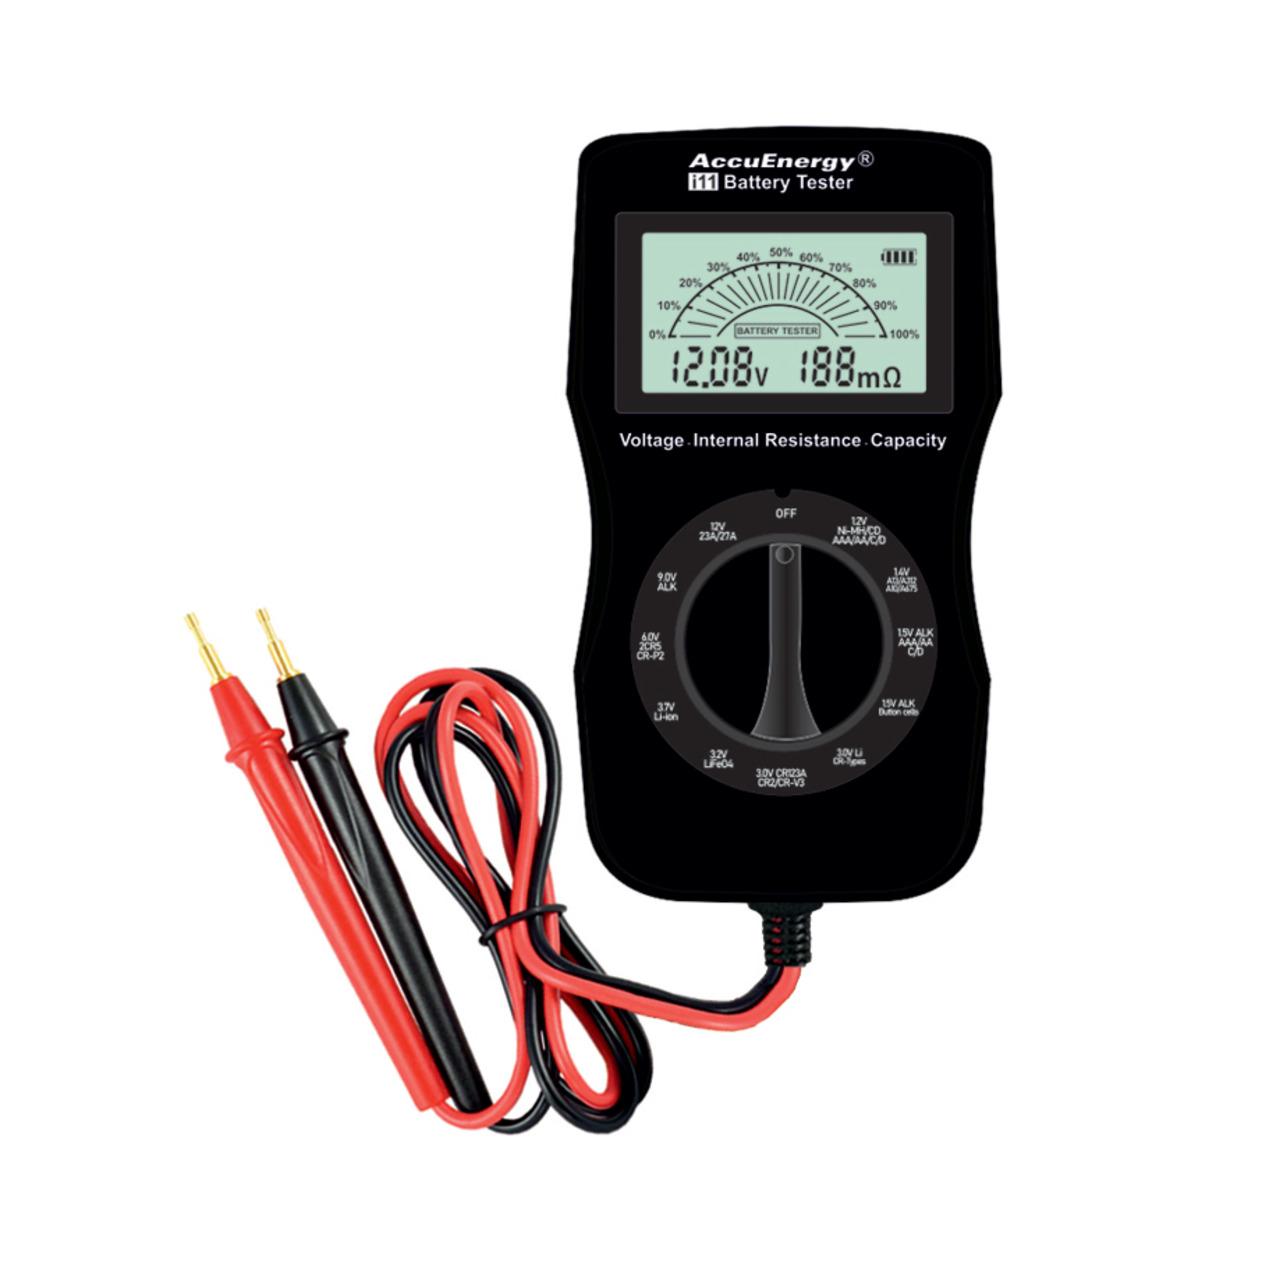 Image of AccuEnergy Battery Tester i11, hochwertiges Batterie- und Akku-Messgerät